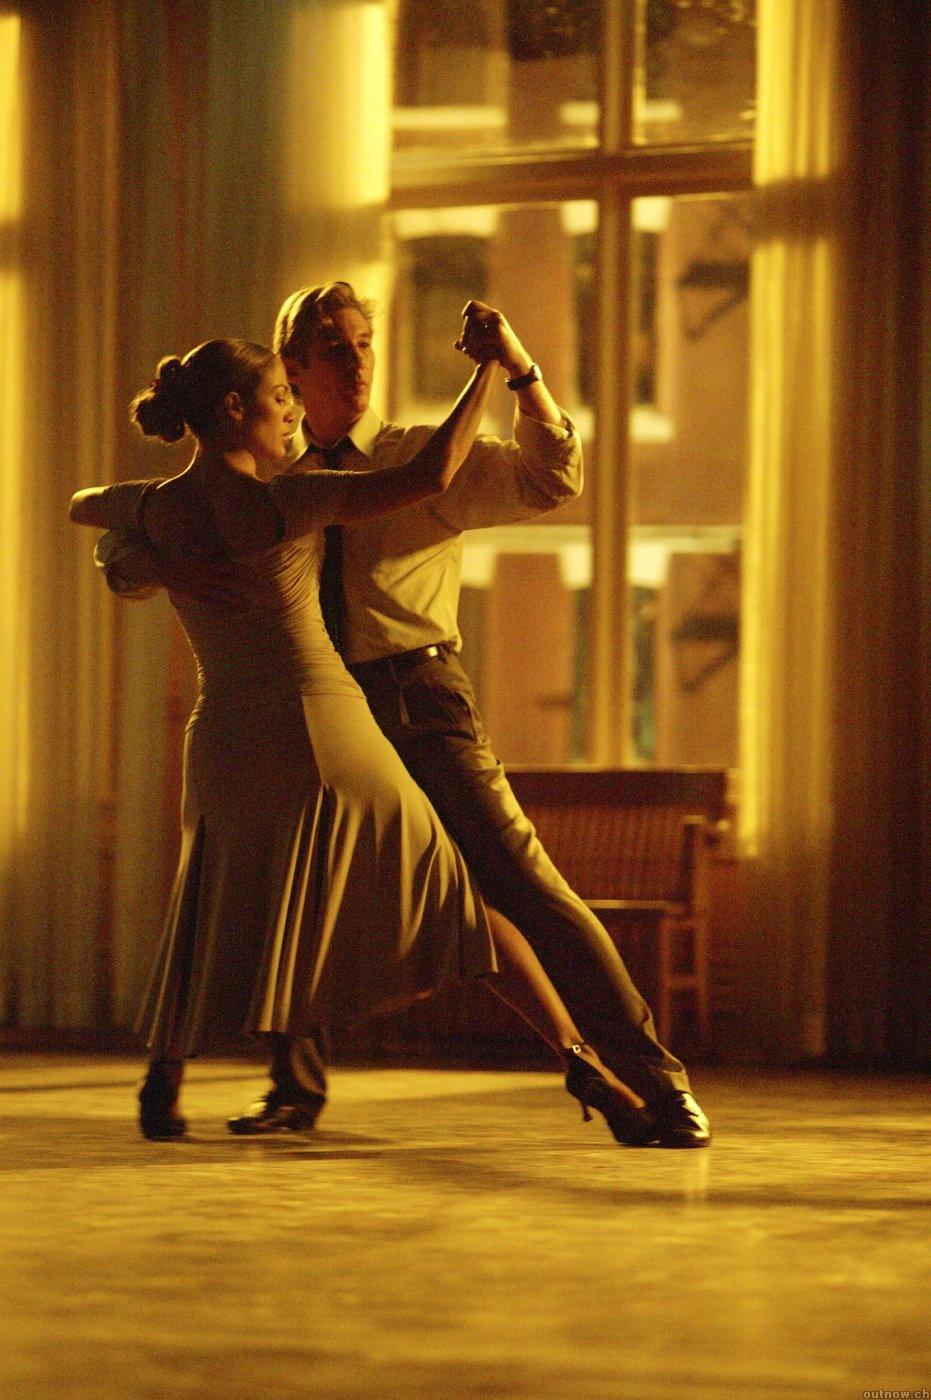 shall we dance - photo #30